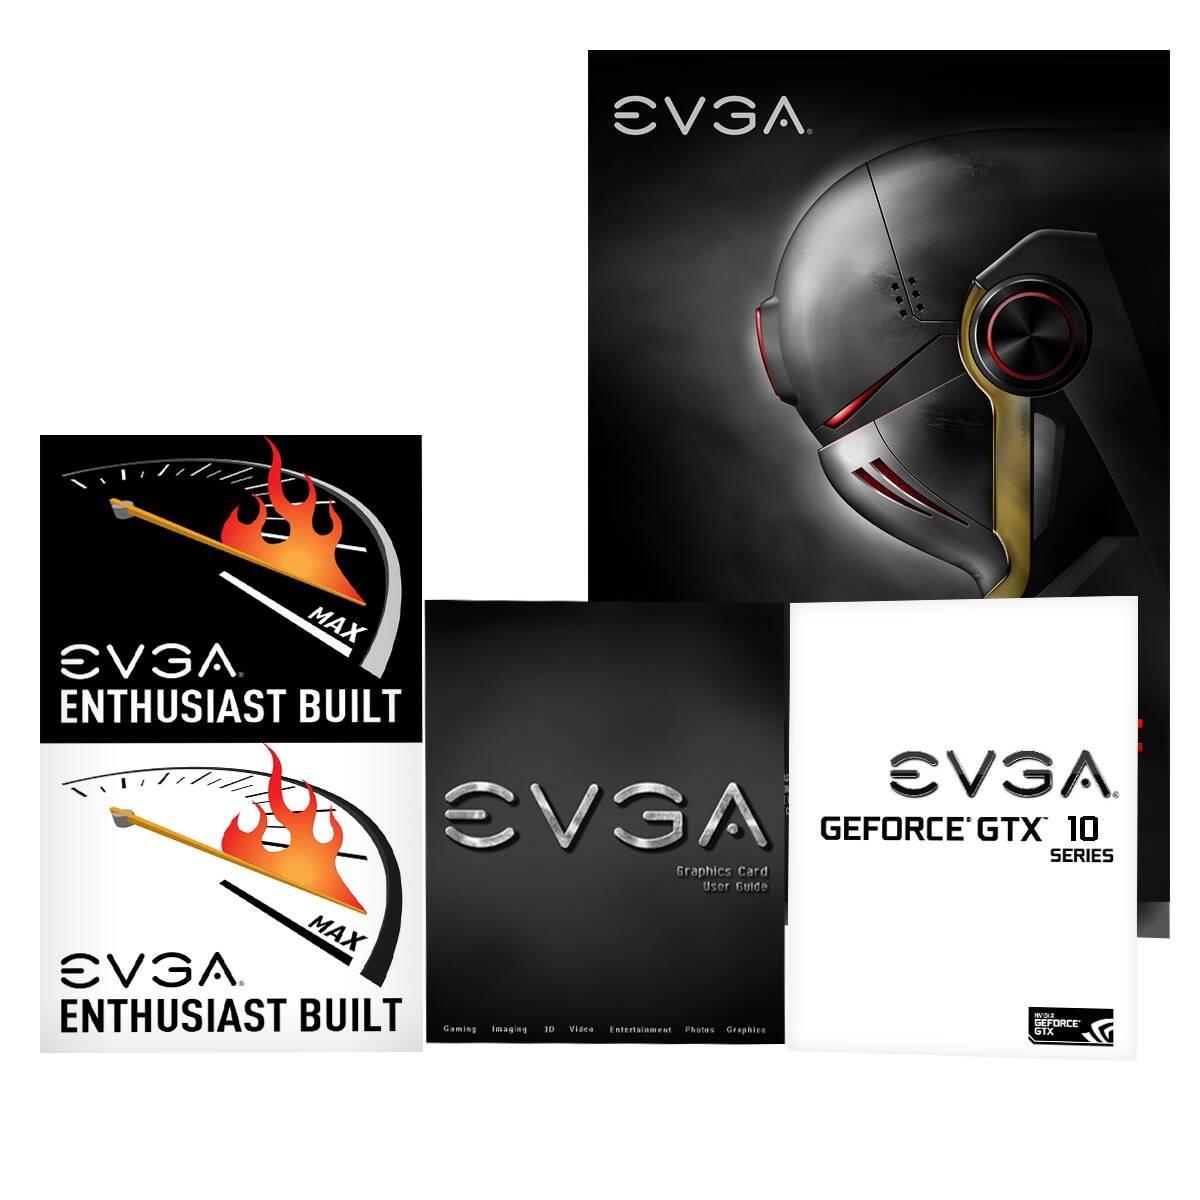 iCX Cooler /& LED EVGA GeForce GTX 1080 Ti SC Black Edition GAMING Interlaced Pin Fin Grafikkarte 11G-P4-6393-KR 11GB GDDR5X Optimized Airflow Design